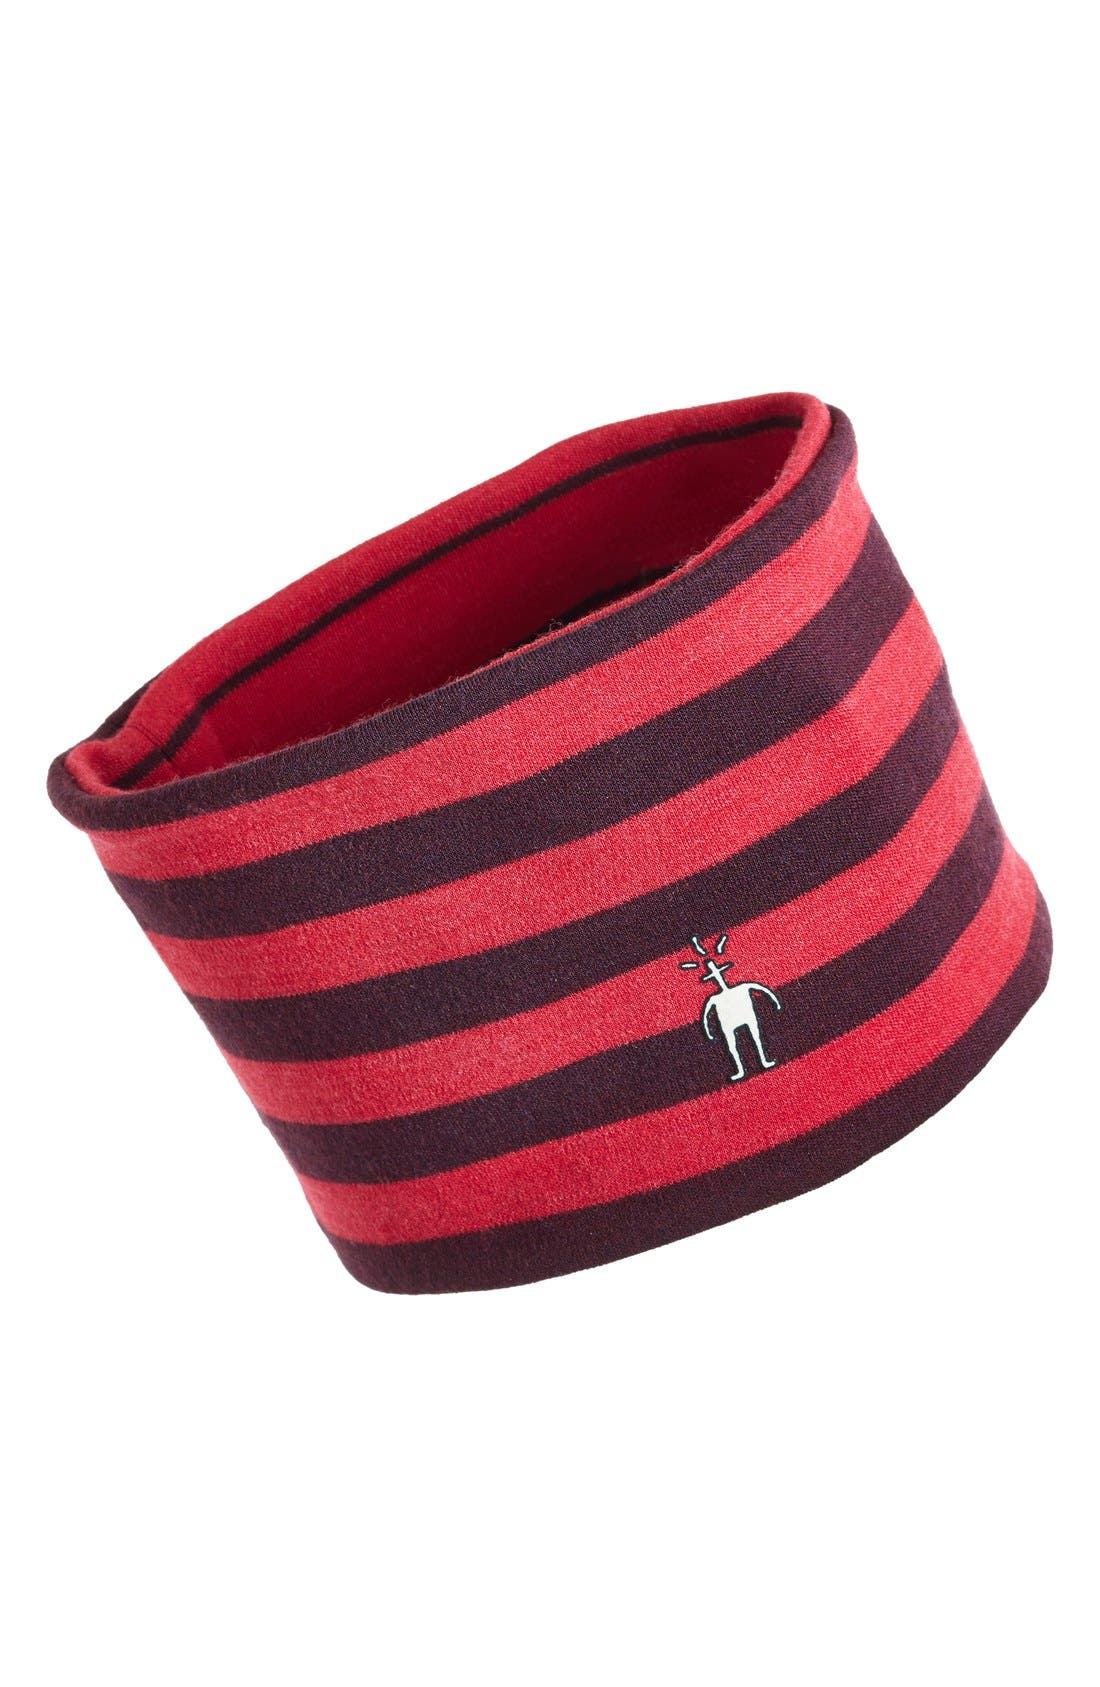 Alternate Image 1 Selected - Smartwool Pattern Headband